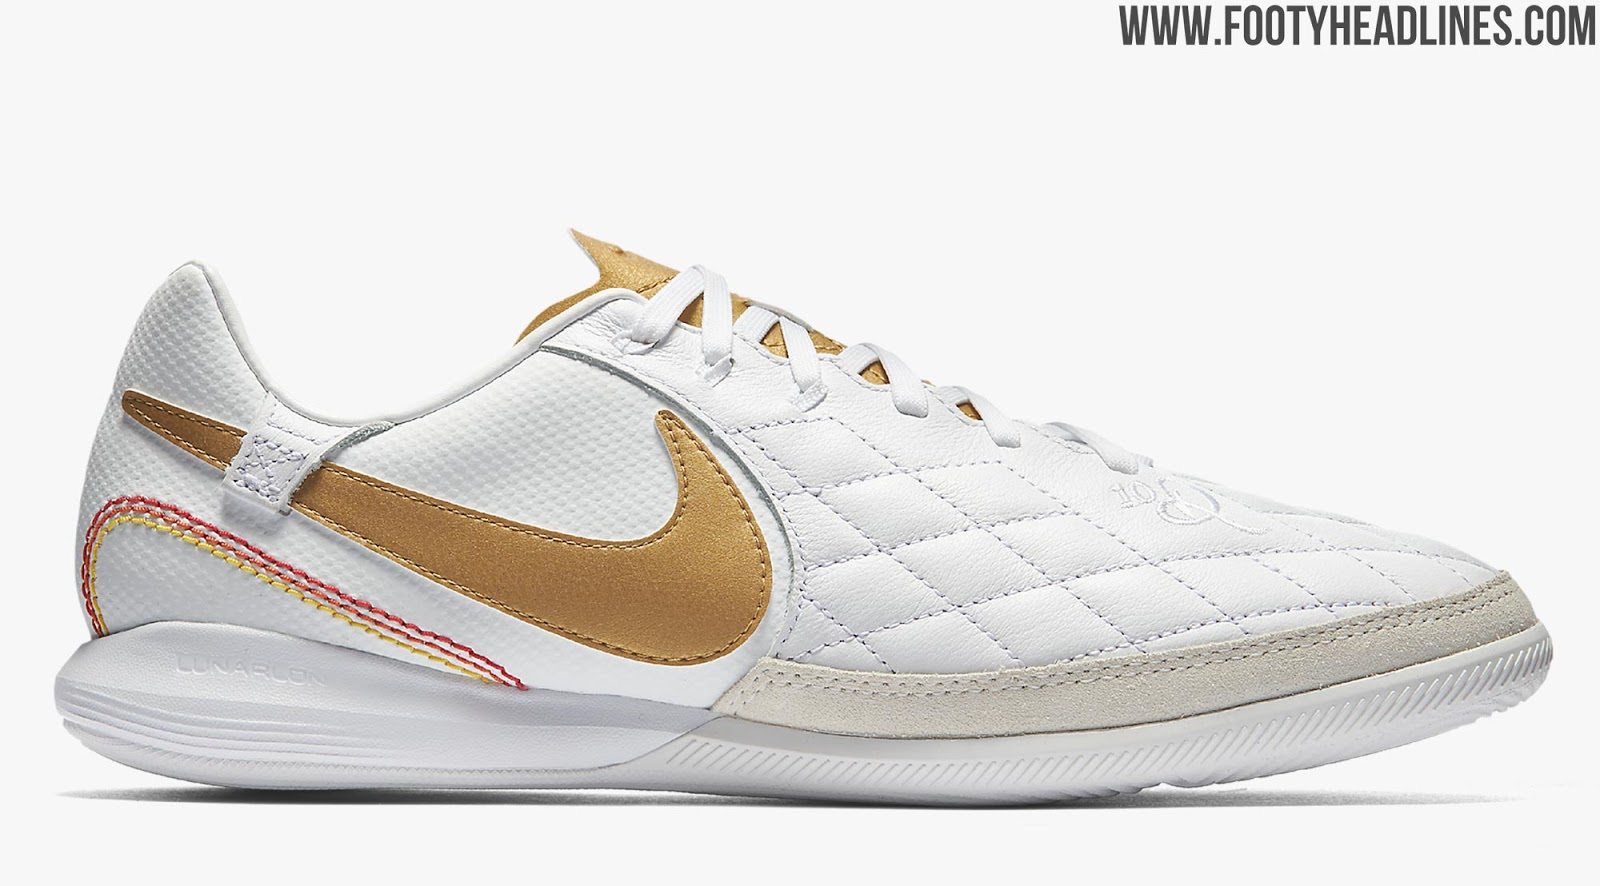 the latest ae548 abc78 White / Gold Nike TiempoX Ronaldinho 'Barcelona' Boots ...